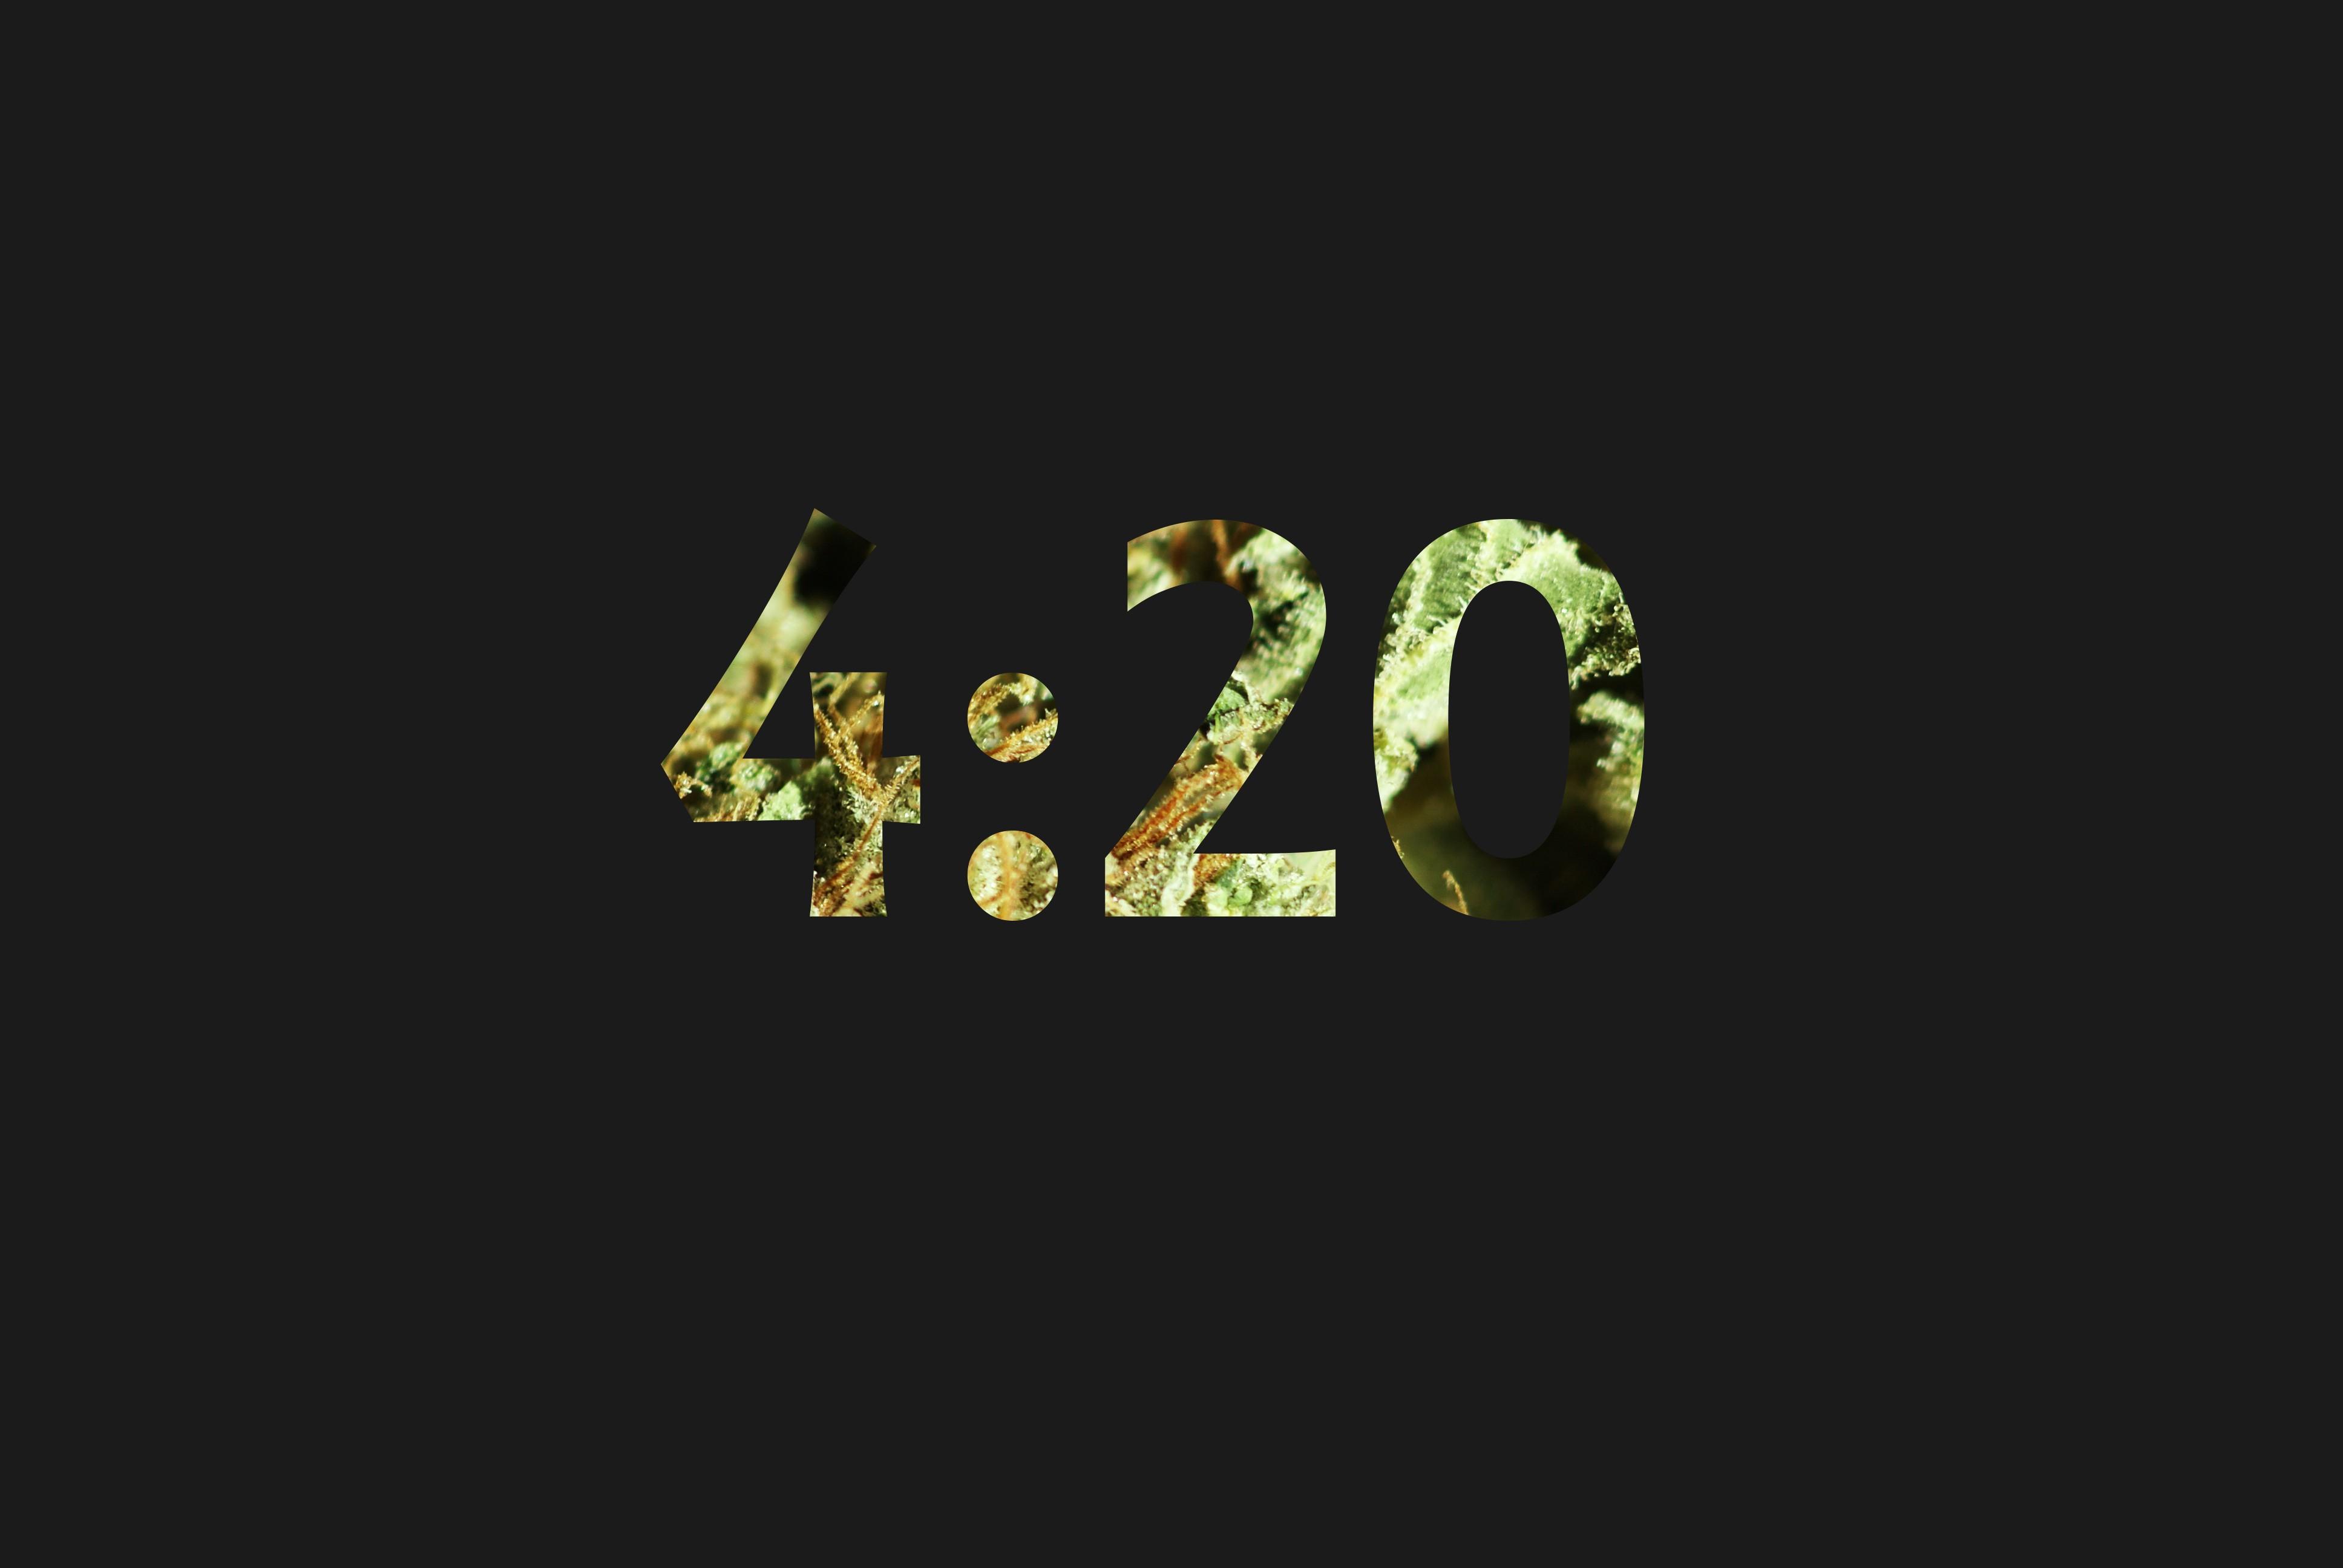 Wallpaper Cannabis Drugs Grey 3872x2592 Satanictrvp